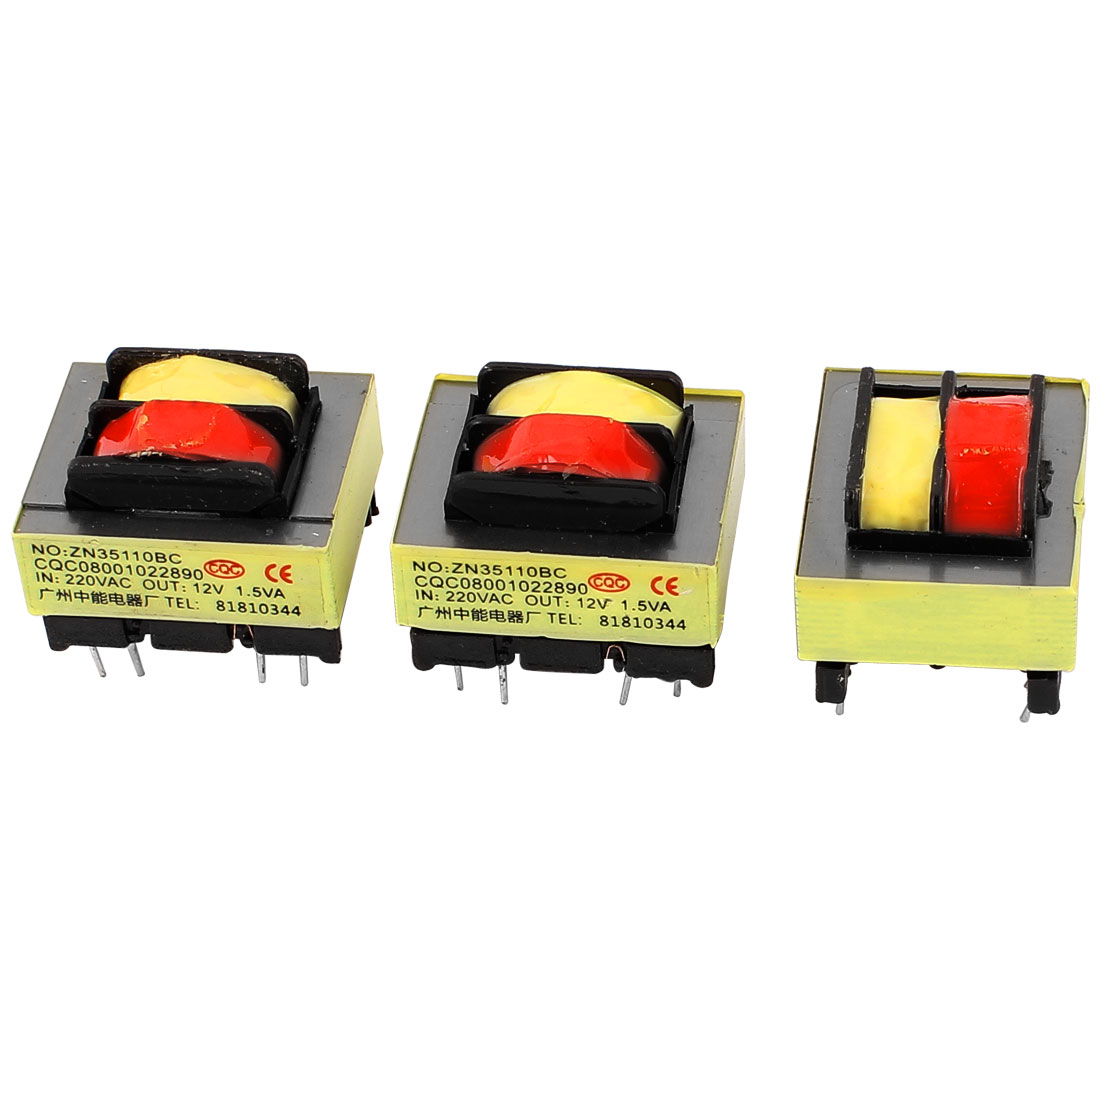 3Pcs 220V Input 12V 1.5W Output Yellow Red Ferrite Core Power Transformer w 5 Terminals